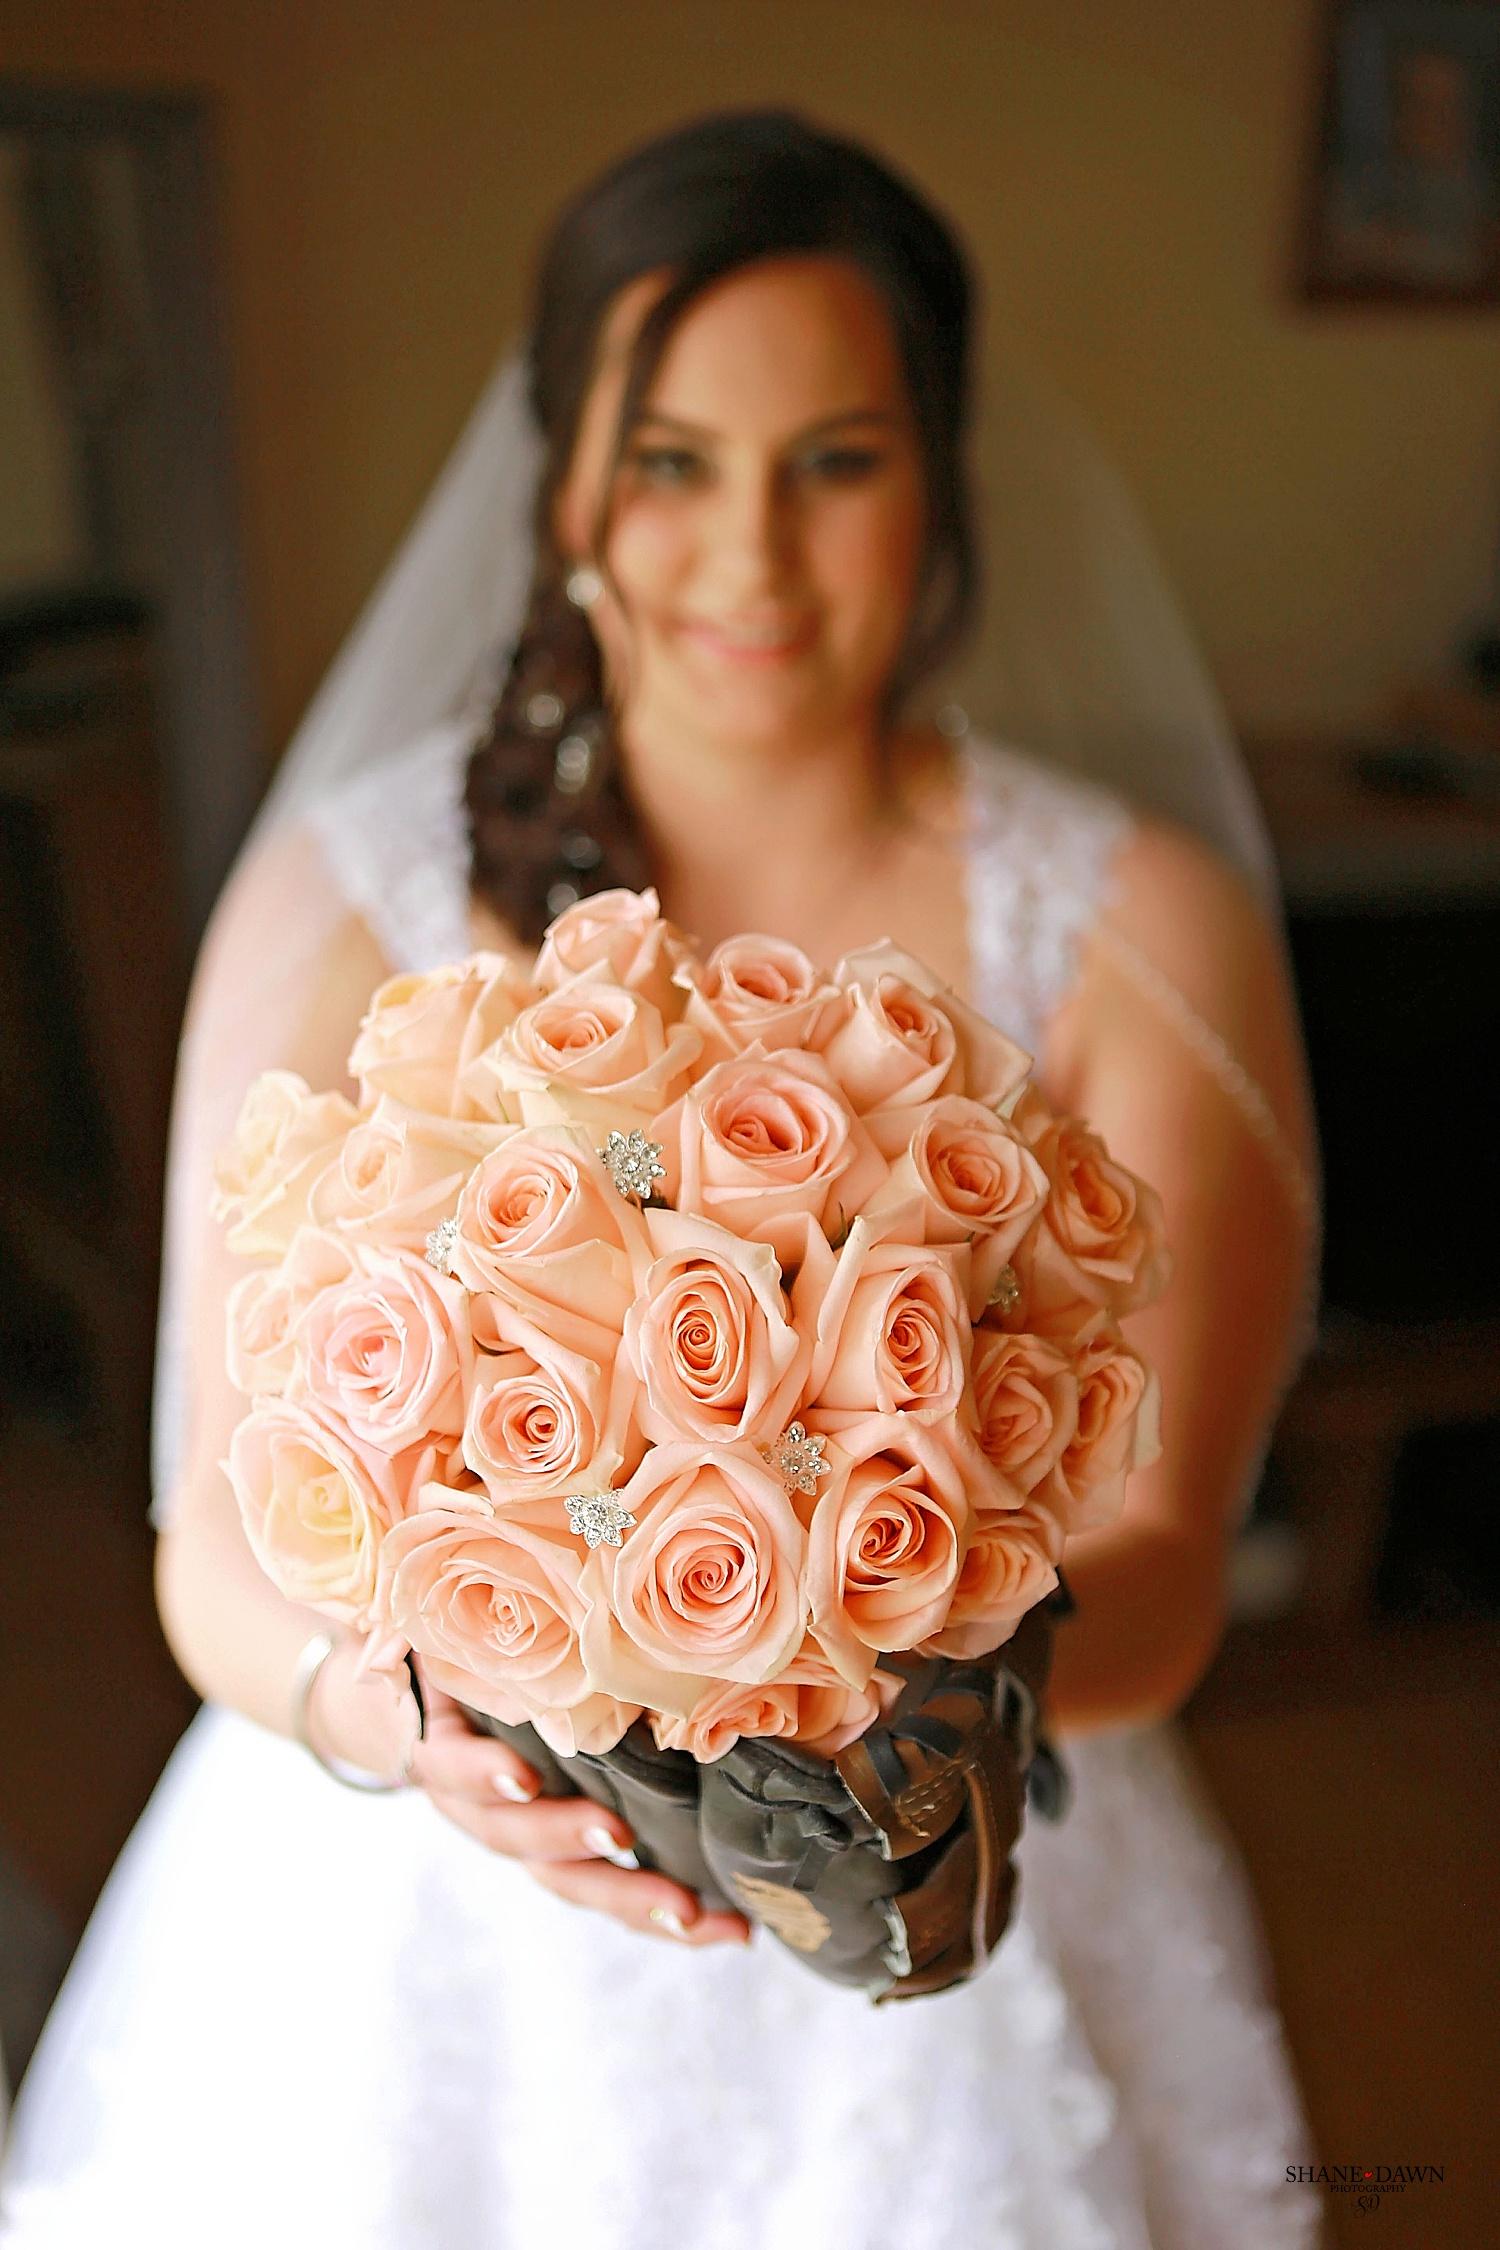 Bride with baseball glove flowers.JPG